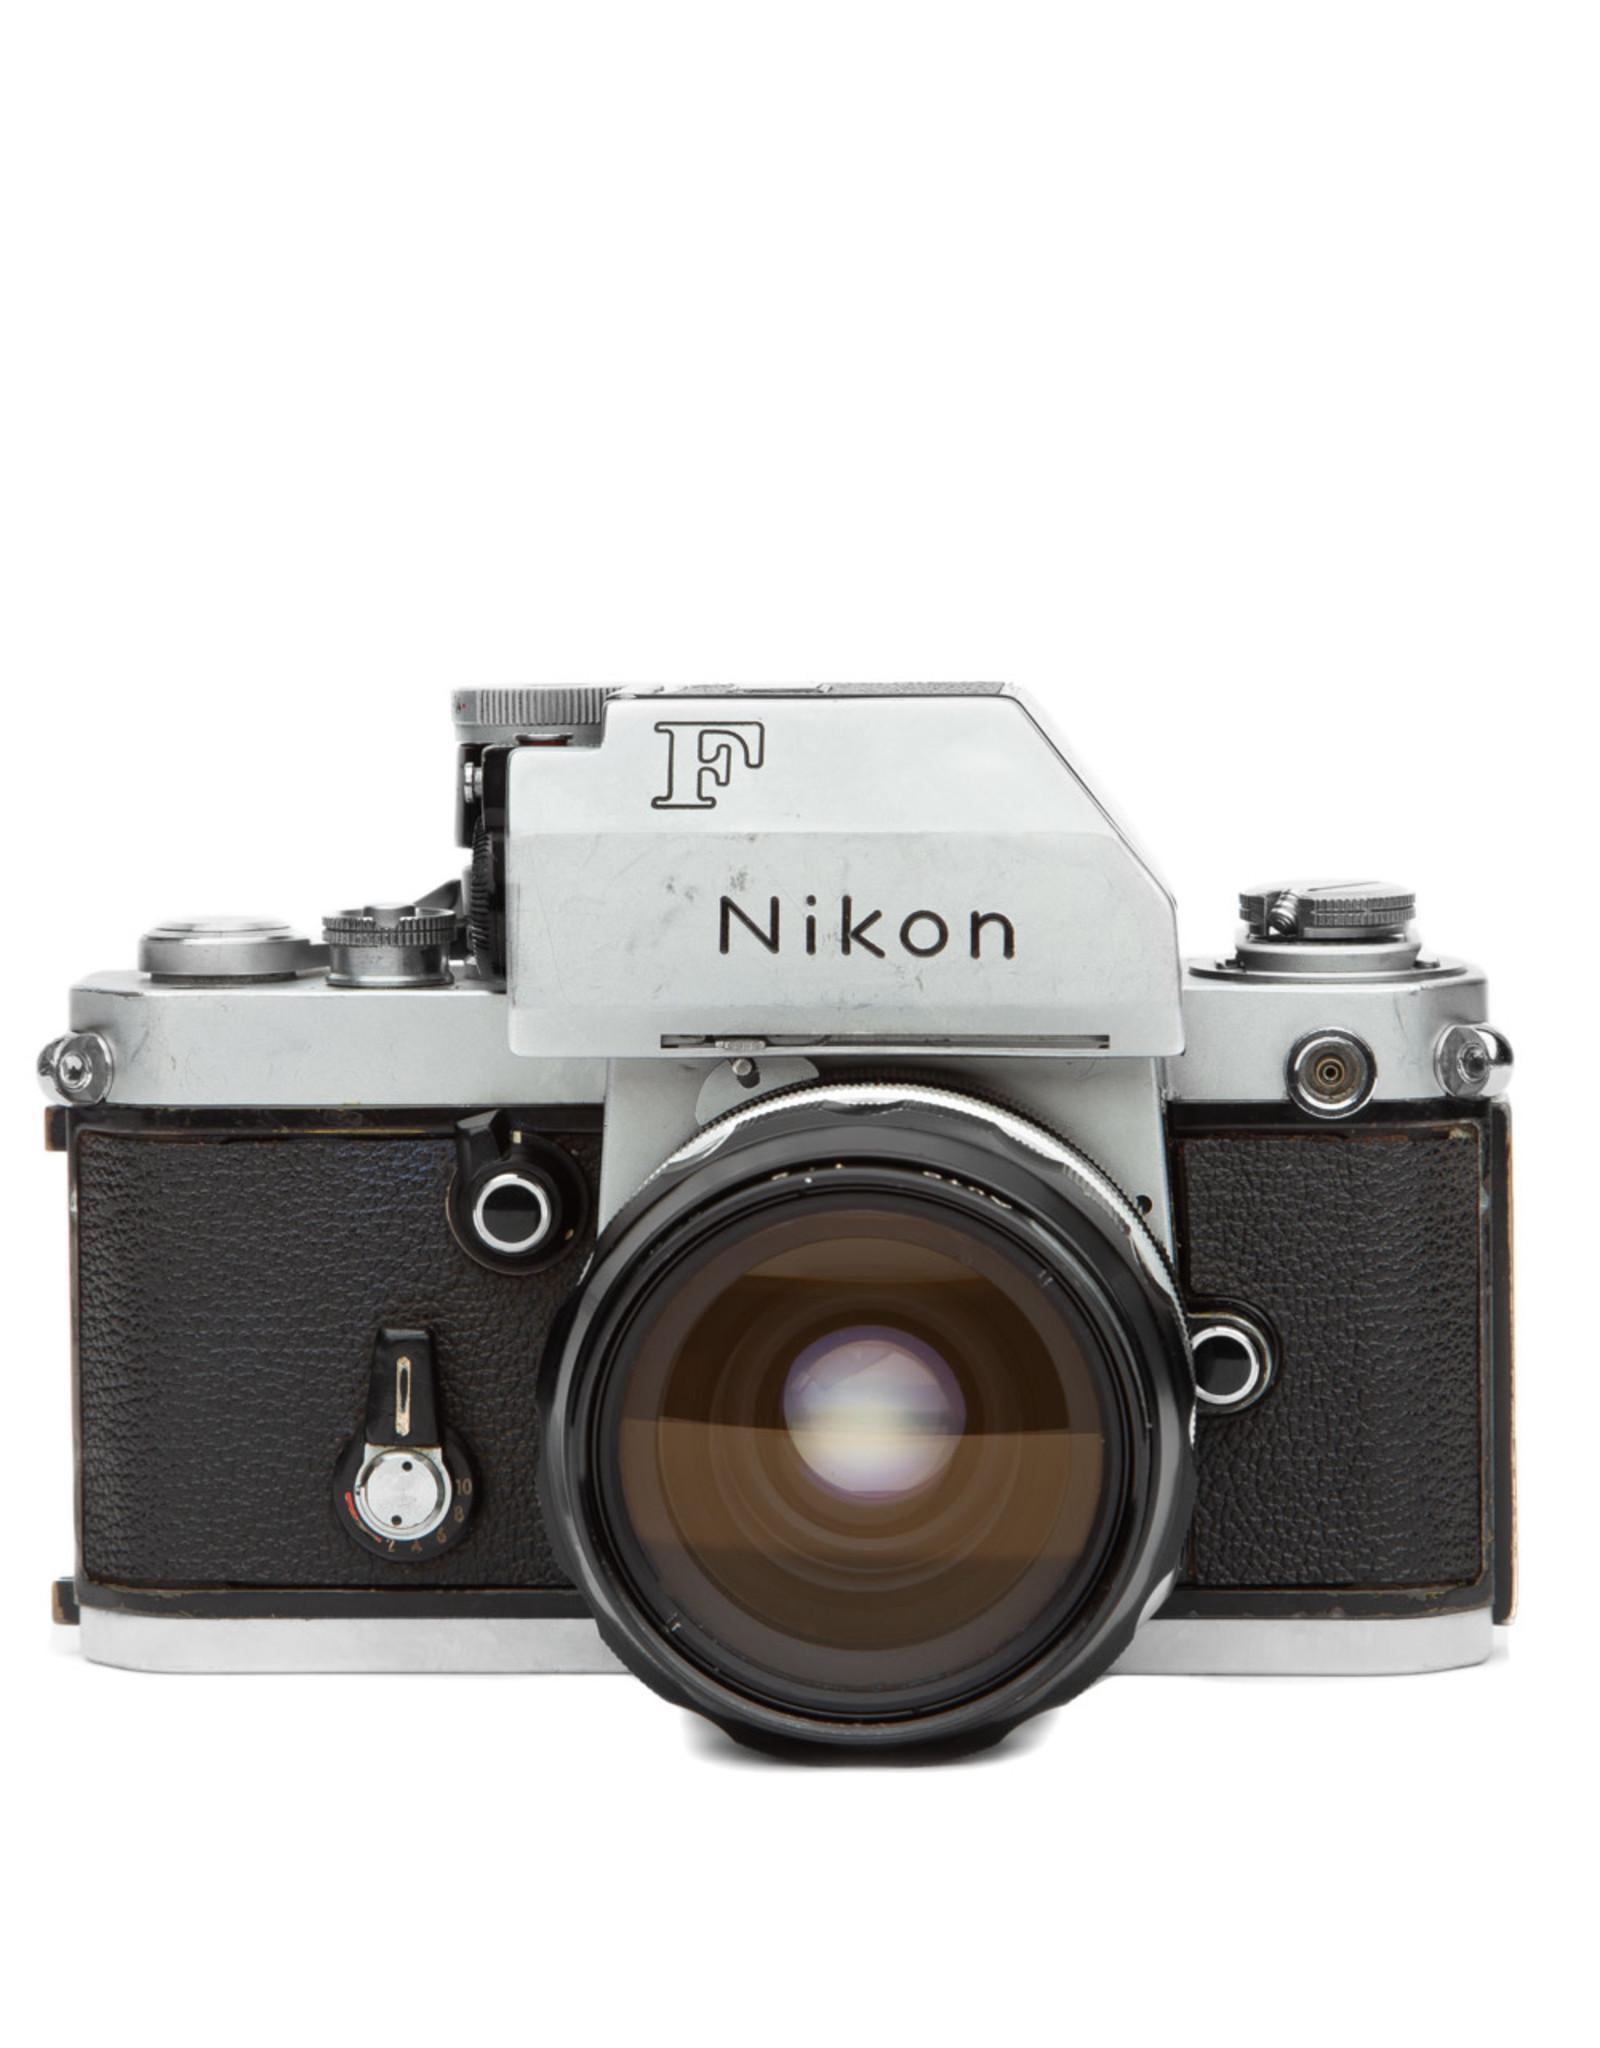 Nikon Nikon F2 35mm SLR Camera Body (silver) w/35 f2